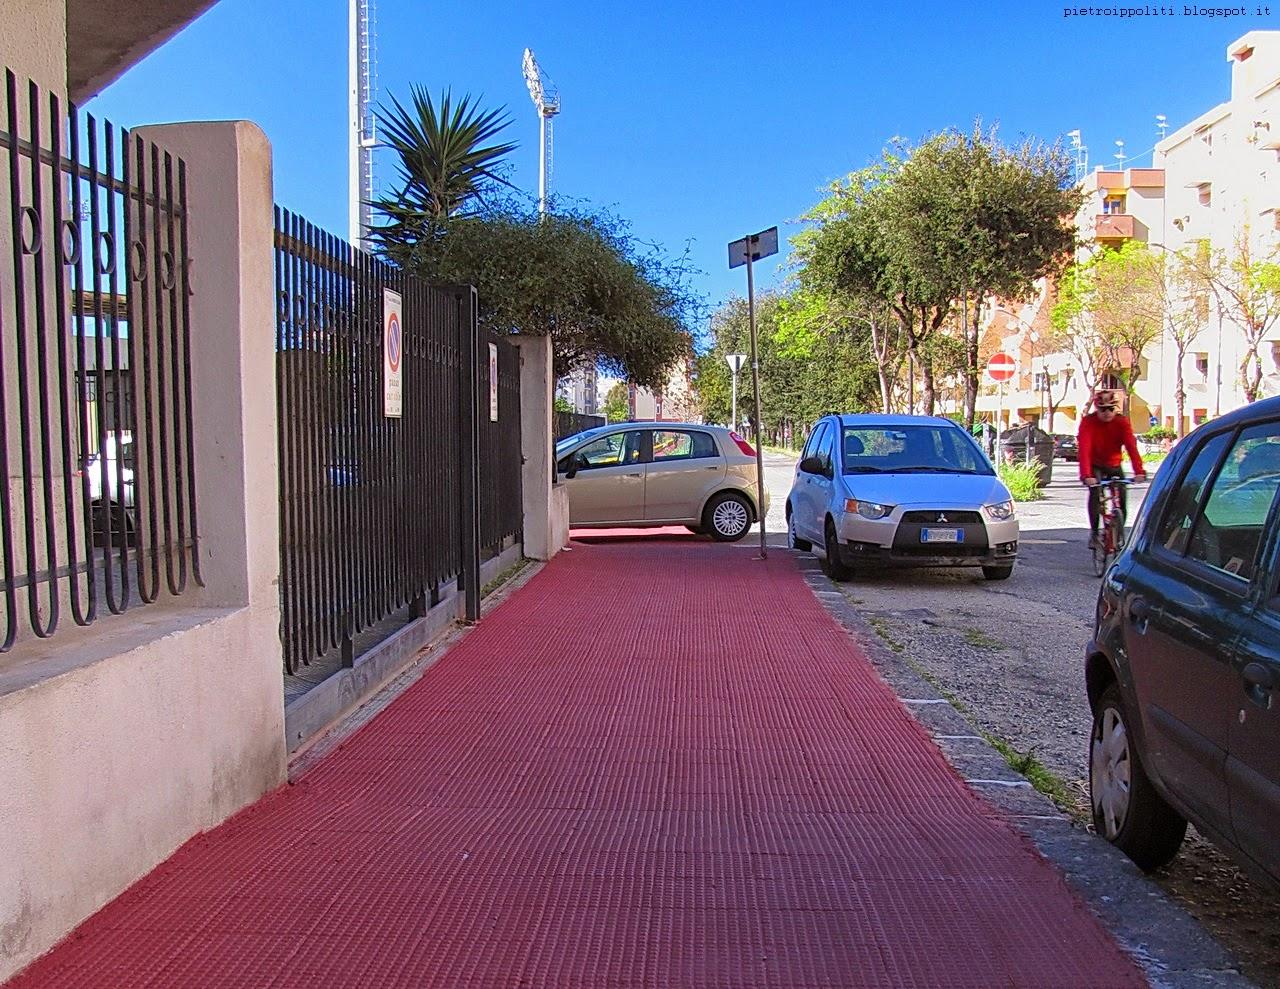 Viale Calabria incrocio con Traversa IX Viale Aldo Moro